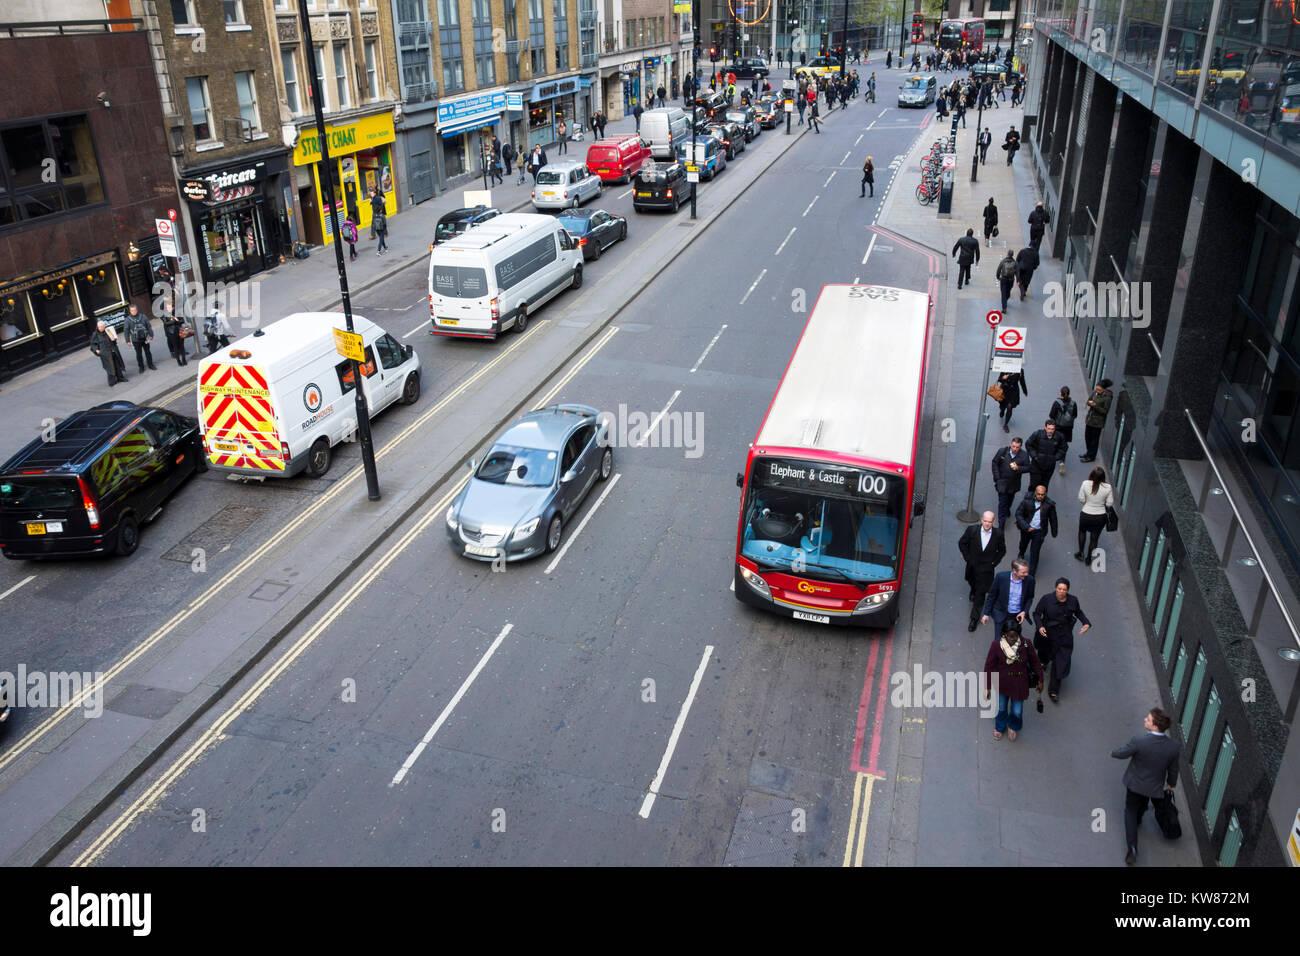 Traffic on Wormwood Street, City of London, UK - Stock Image